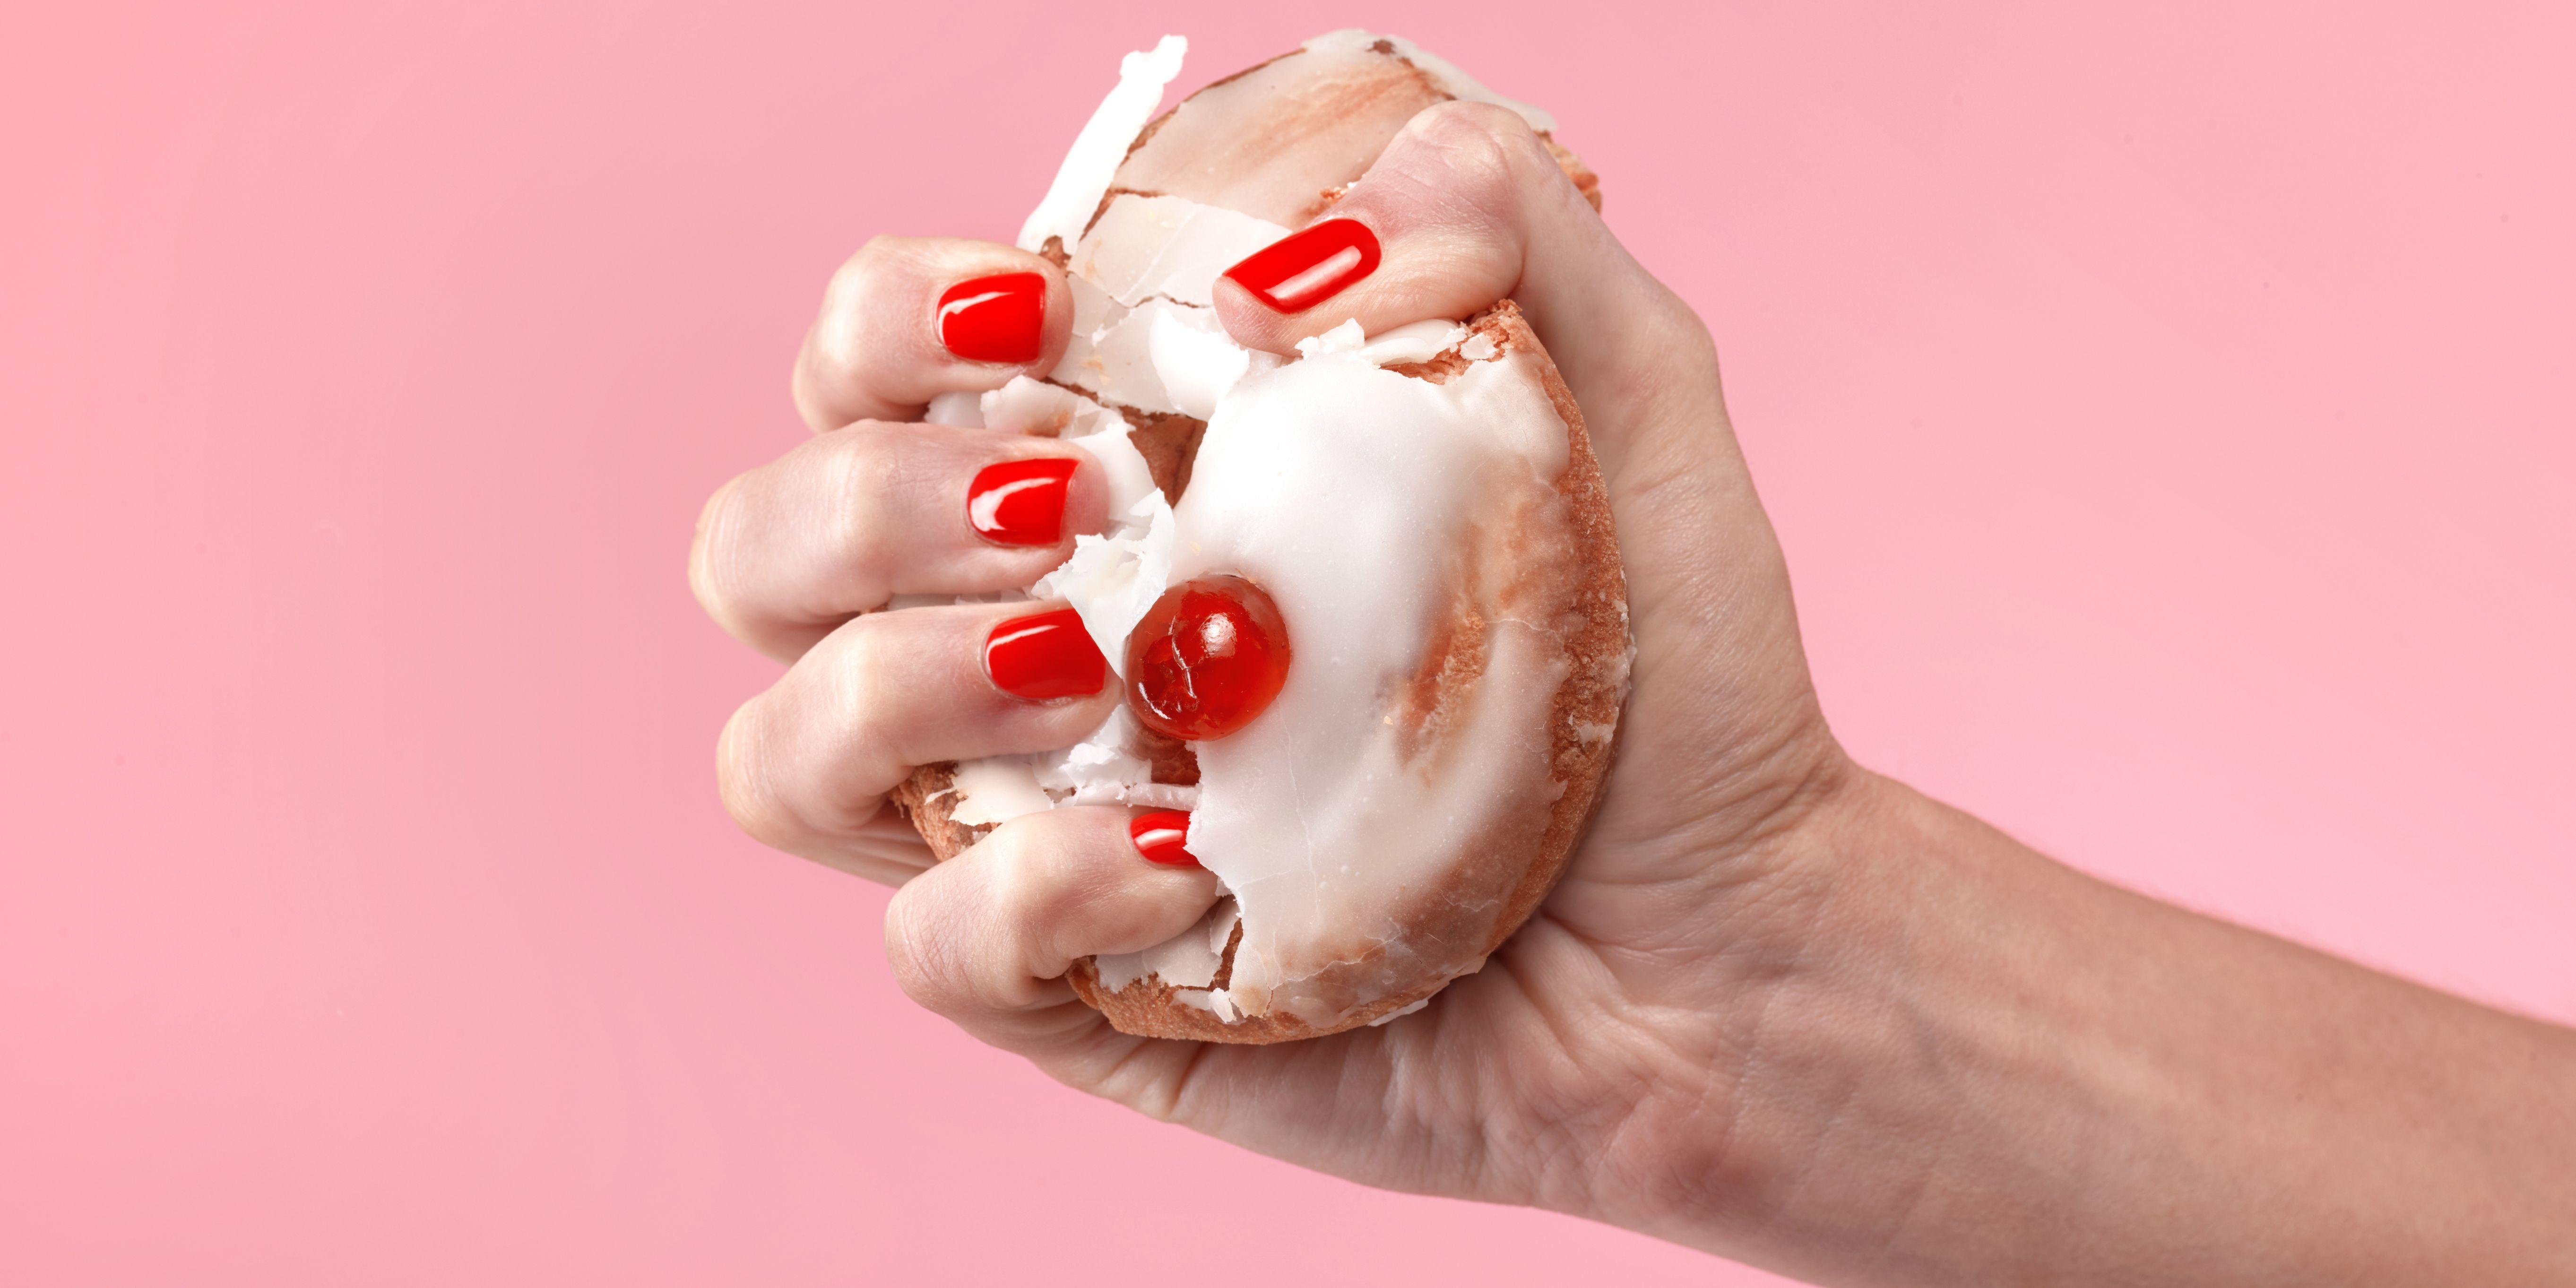 Female dieter crushing belgian bun